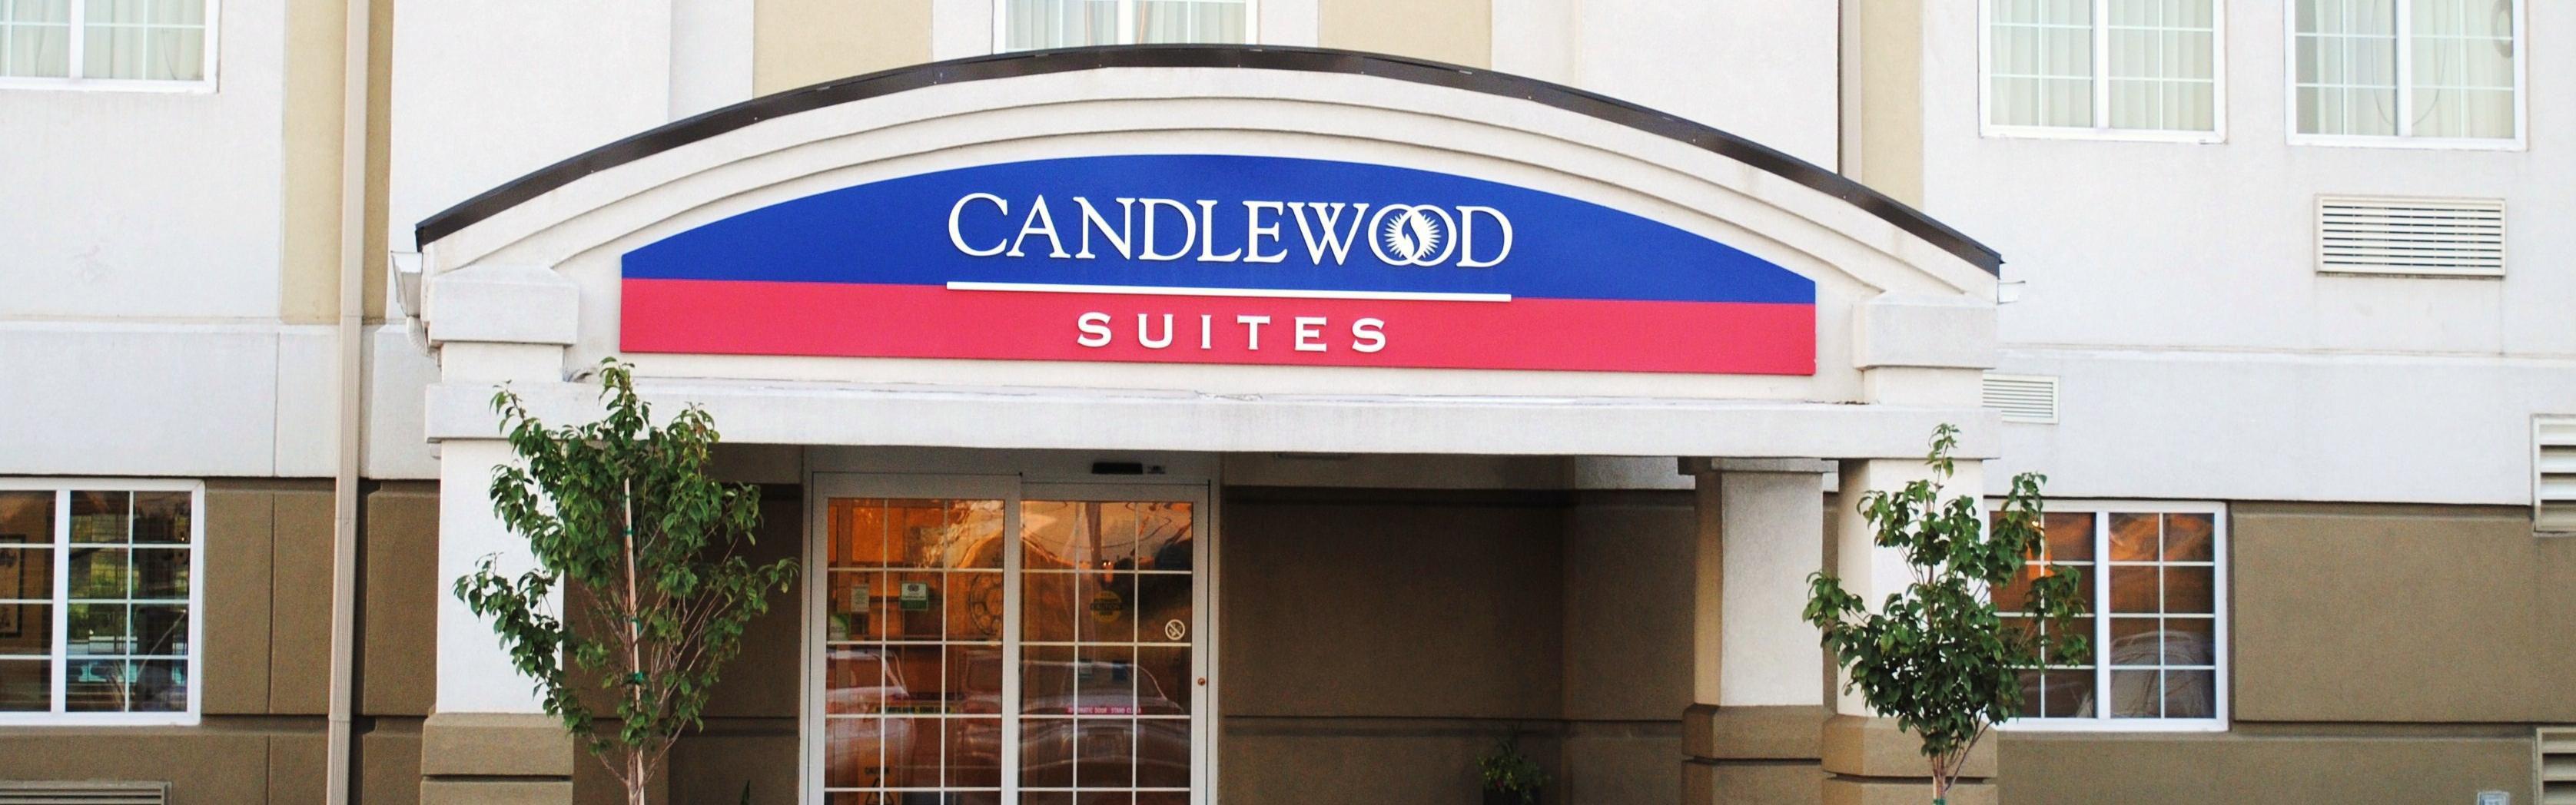 Candlewood Suites Fort Wayne - Nw image 0